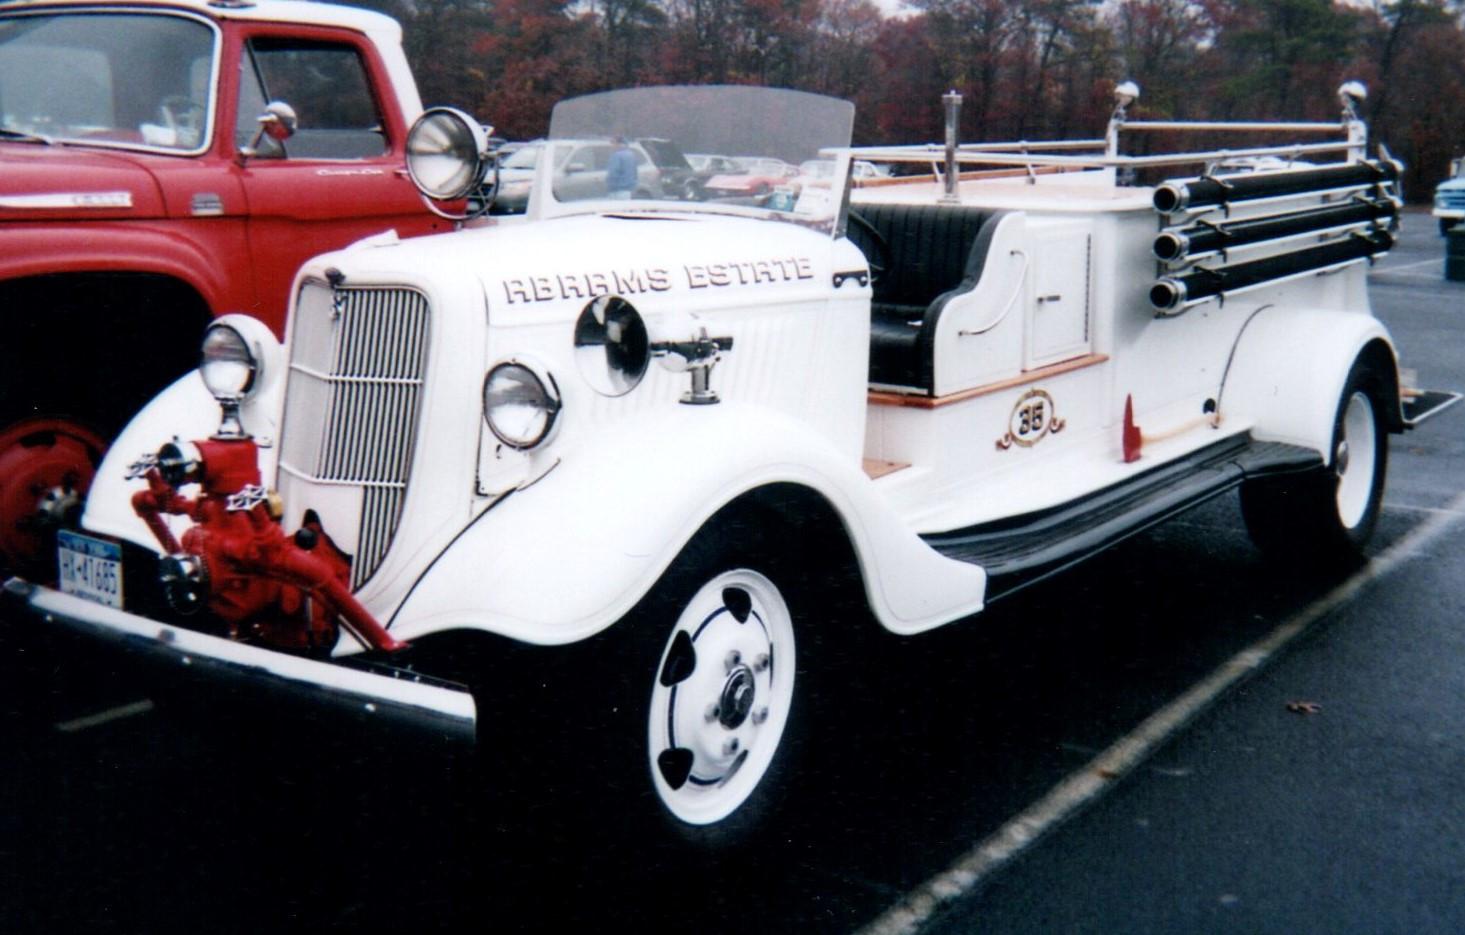 Floyd Chivvis' 1935 Ford